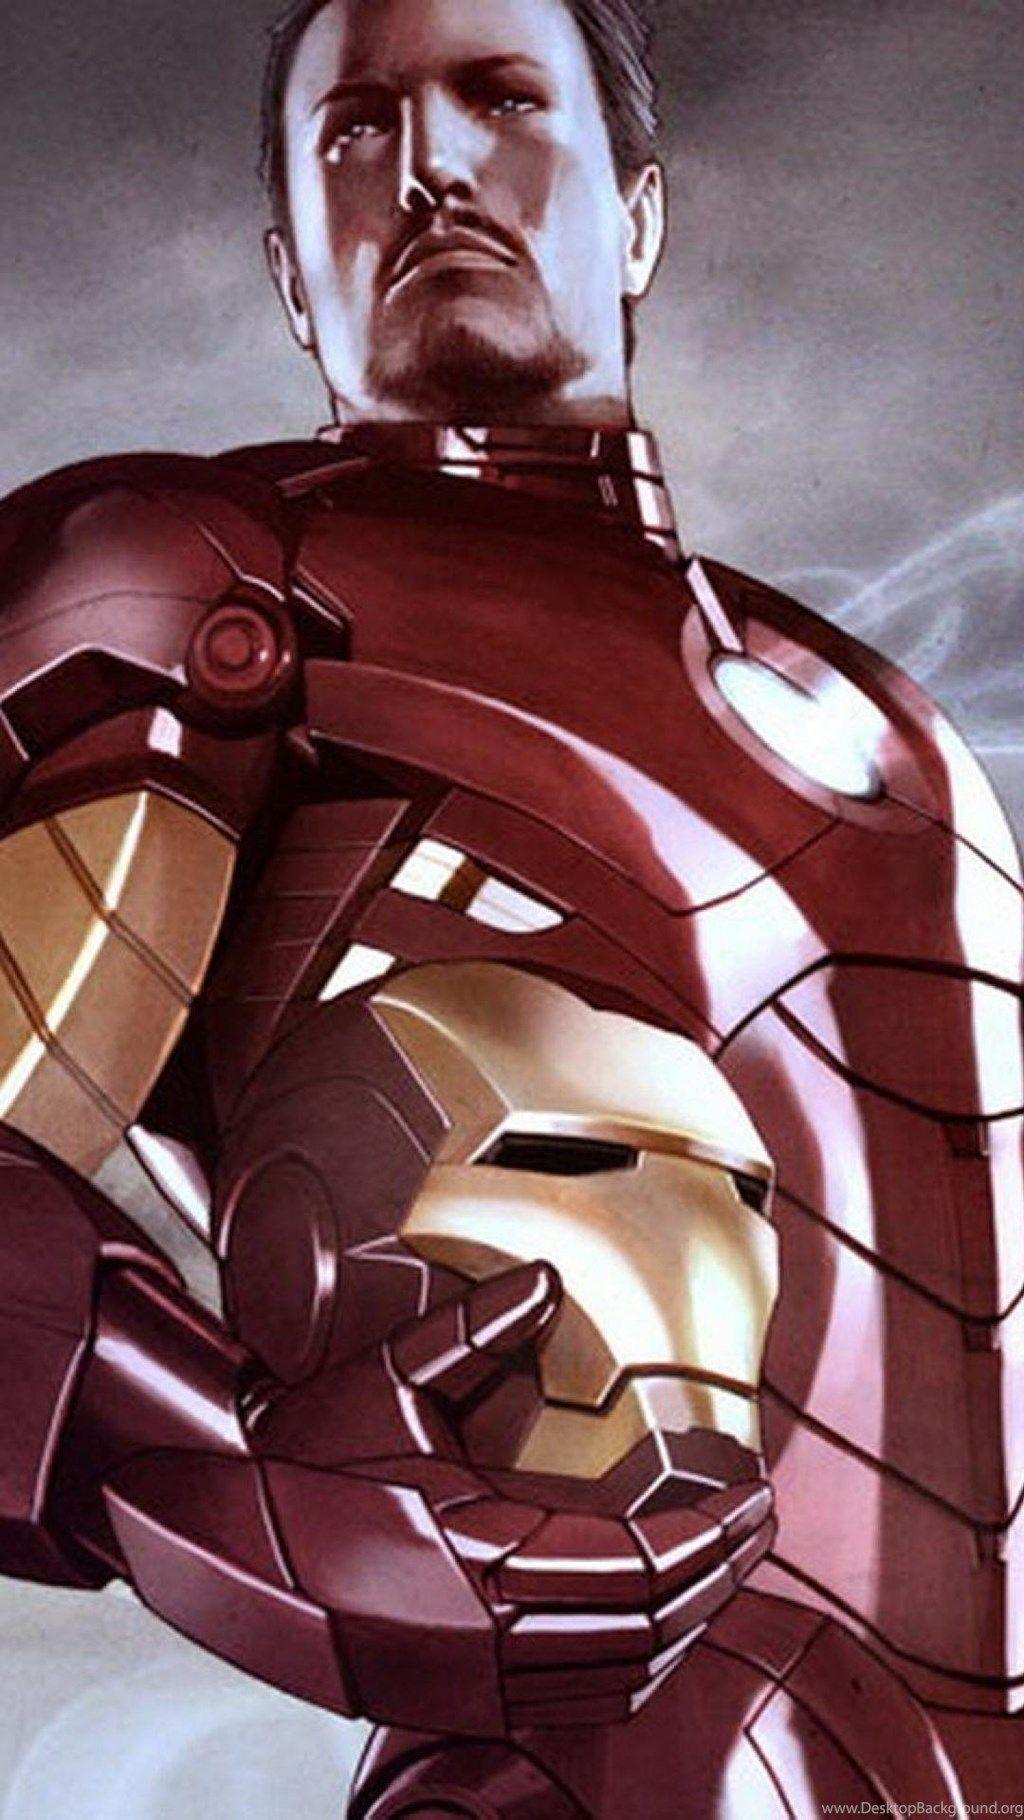 Tony Stark Cartoon Wallpapers - Wallpaper Cave